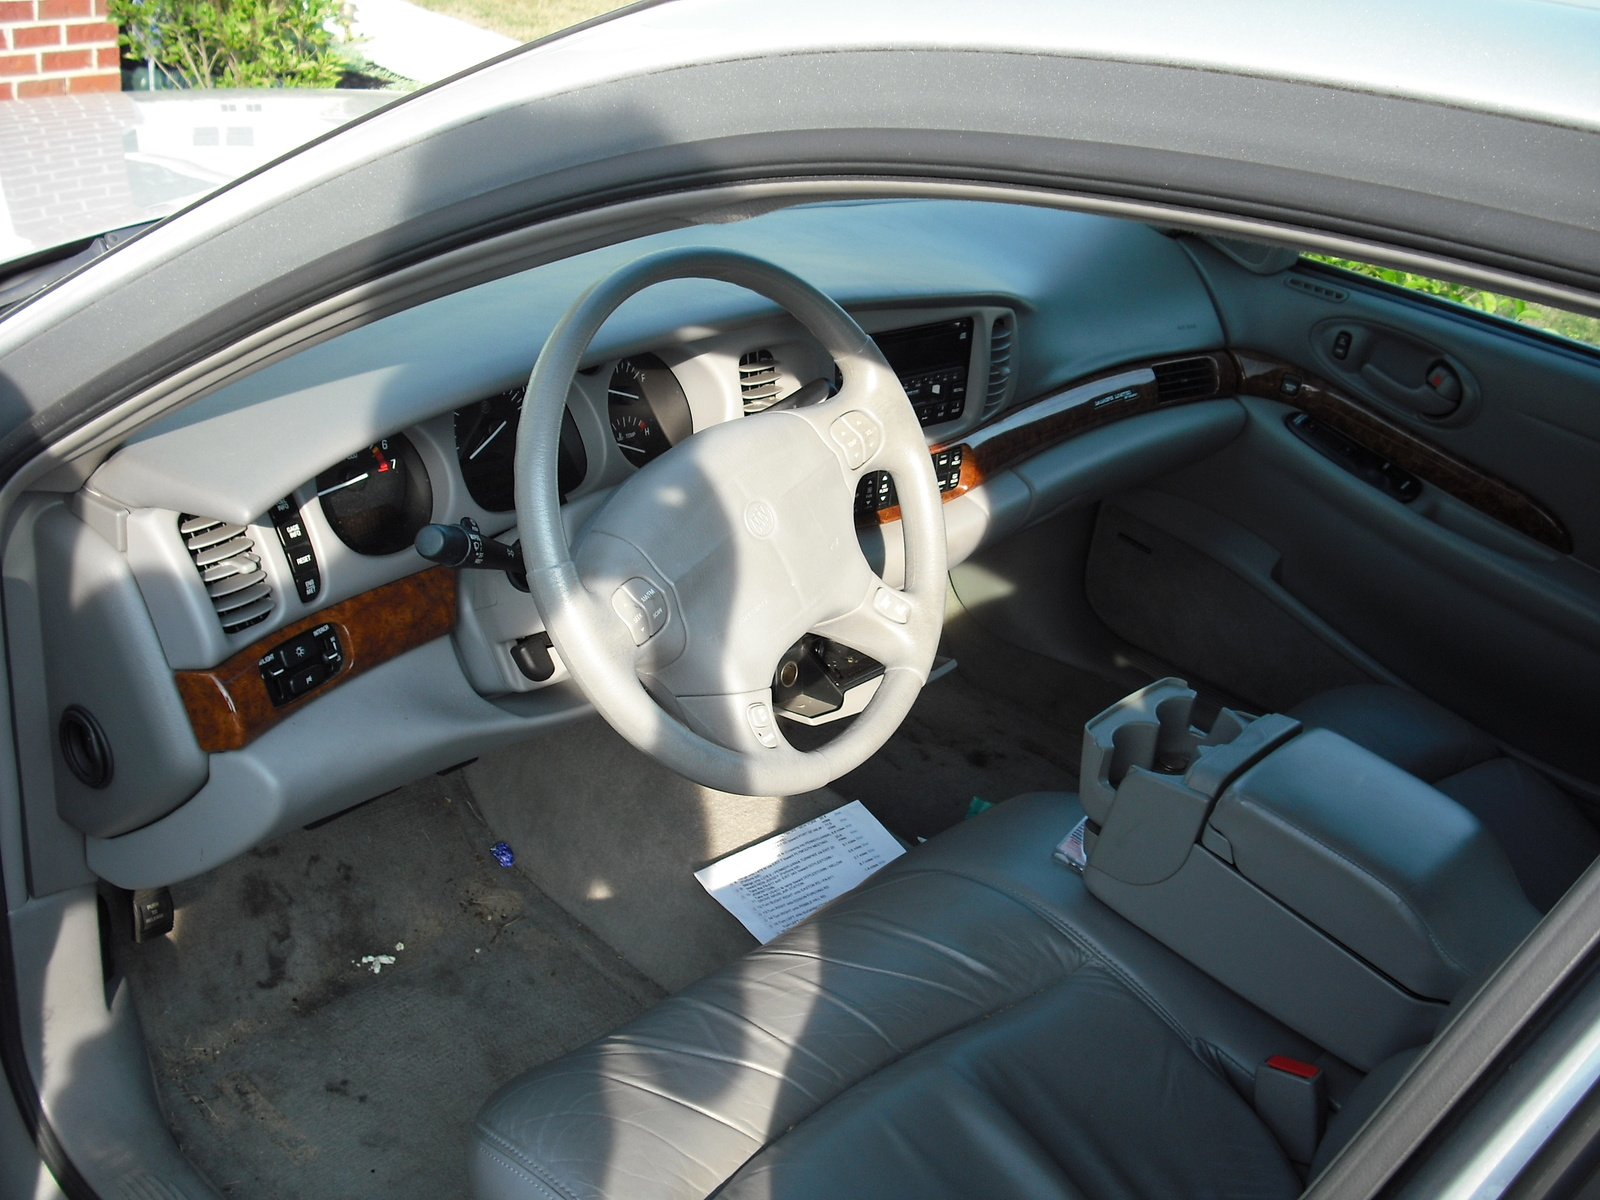 1993 Buick Lesabre Interior